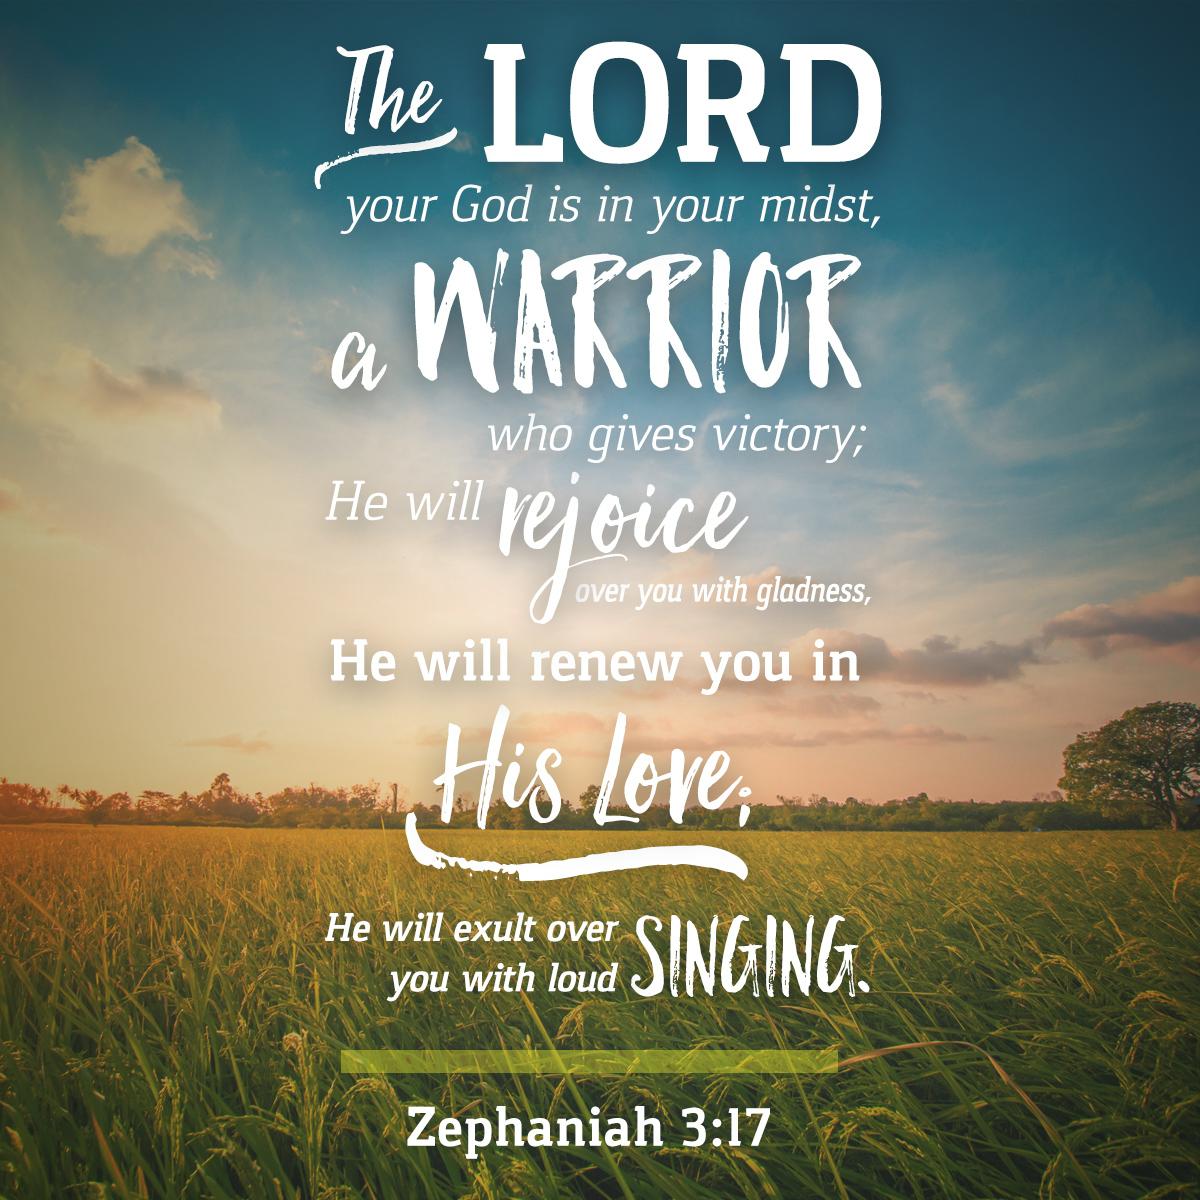 Zephaniah 3:17 - Daily Verse